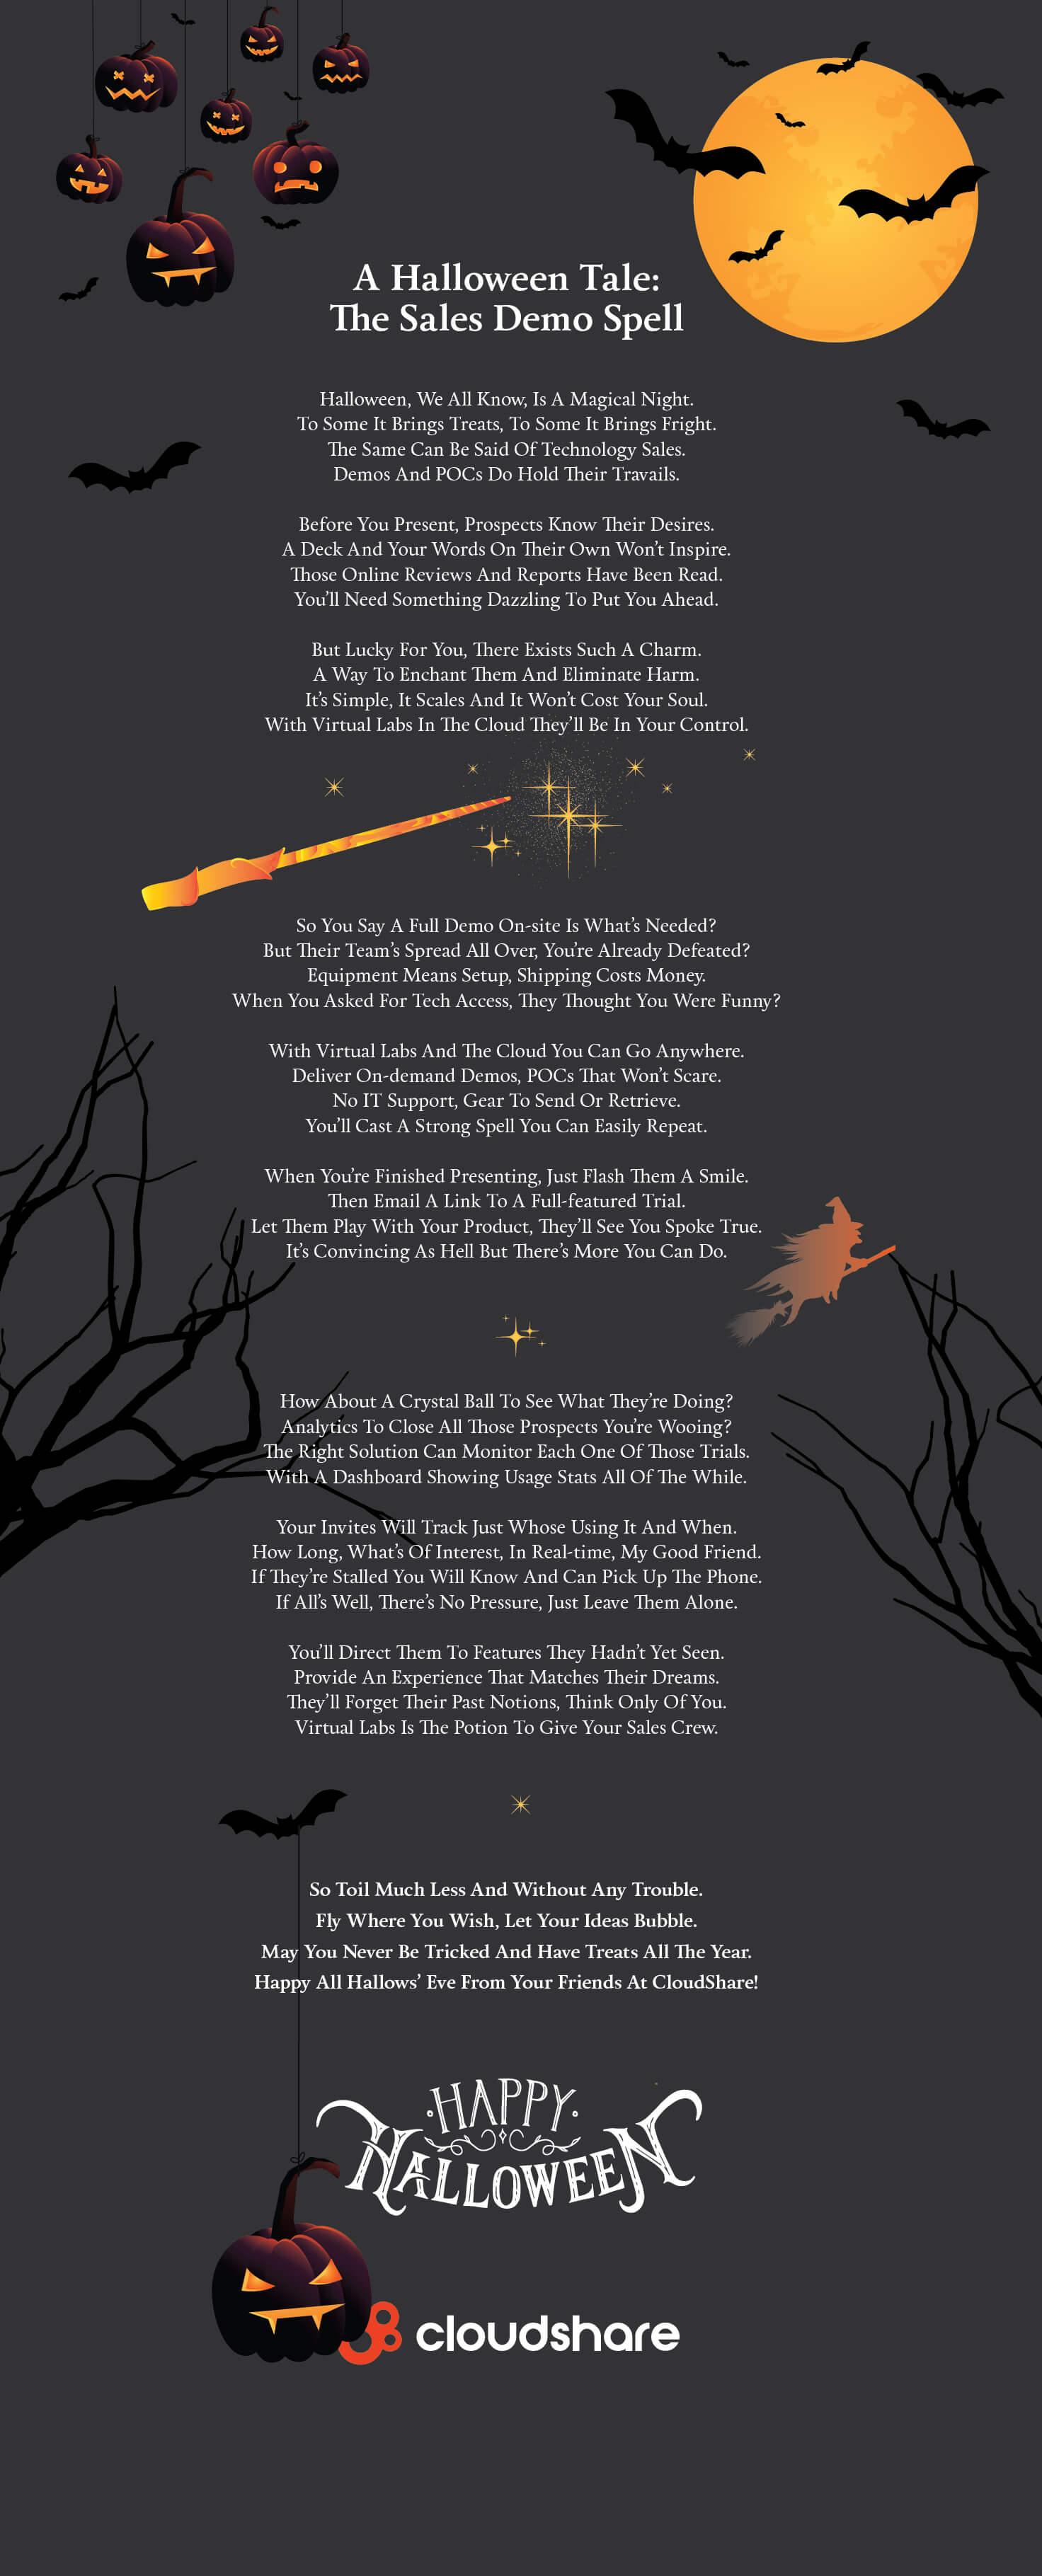 cloudshare halloween poem